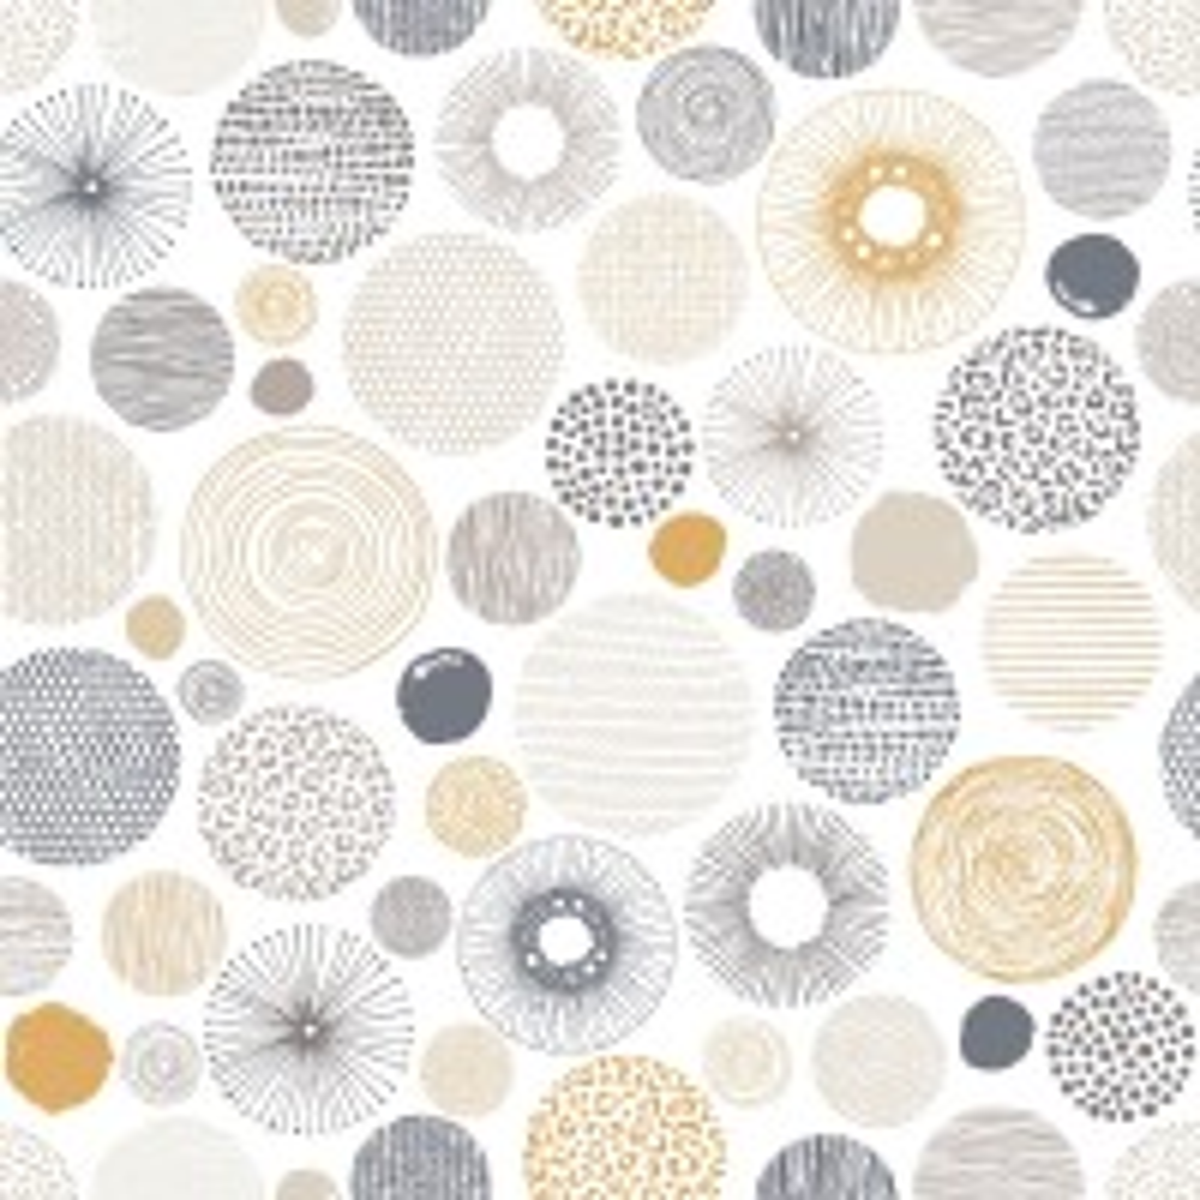 Fancy Abstract Circles Wallpaper Mural